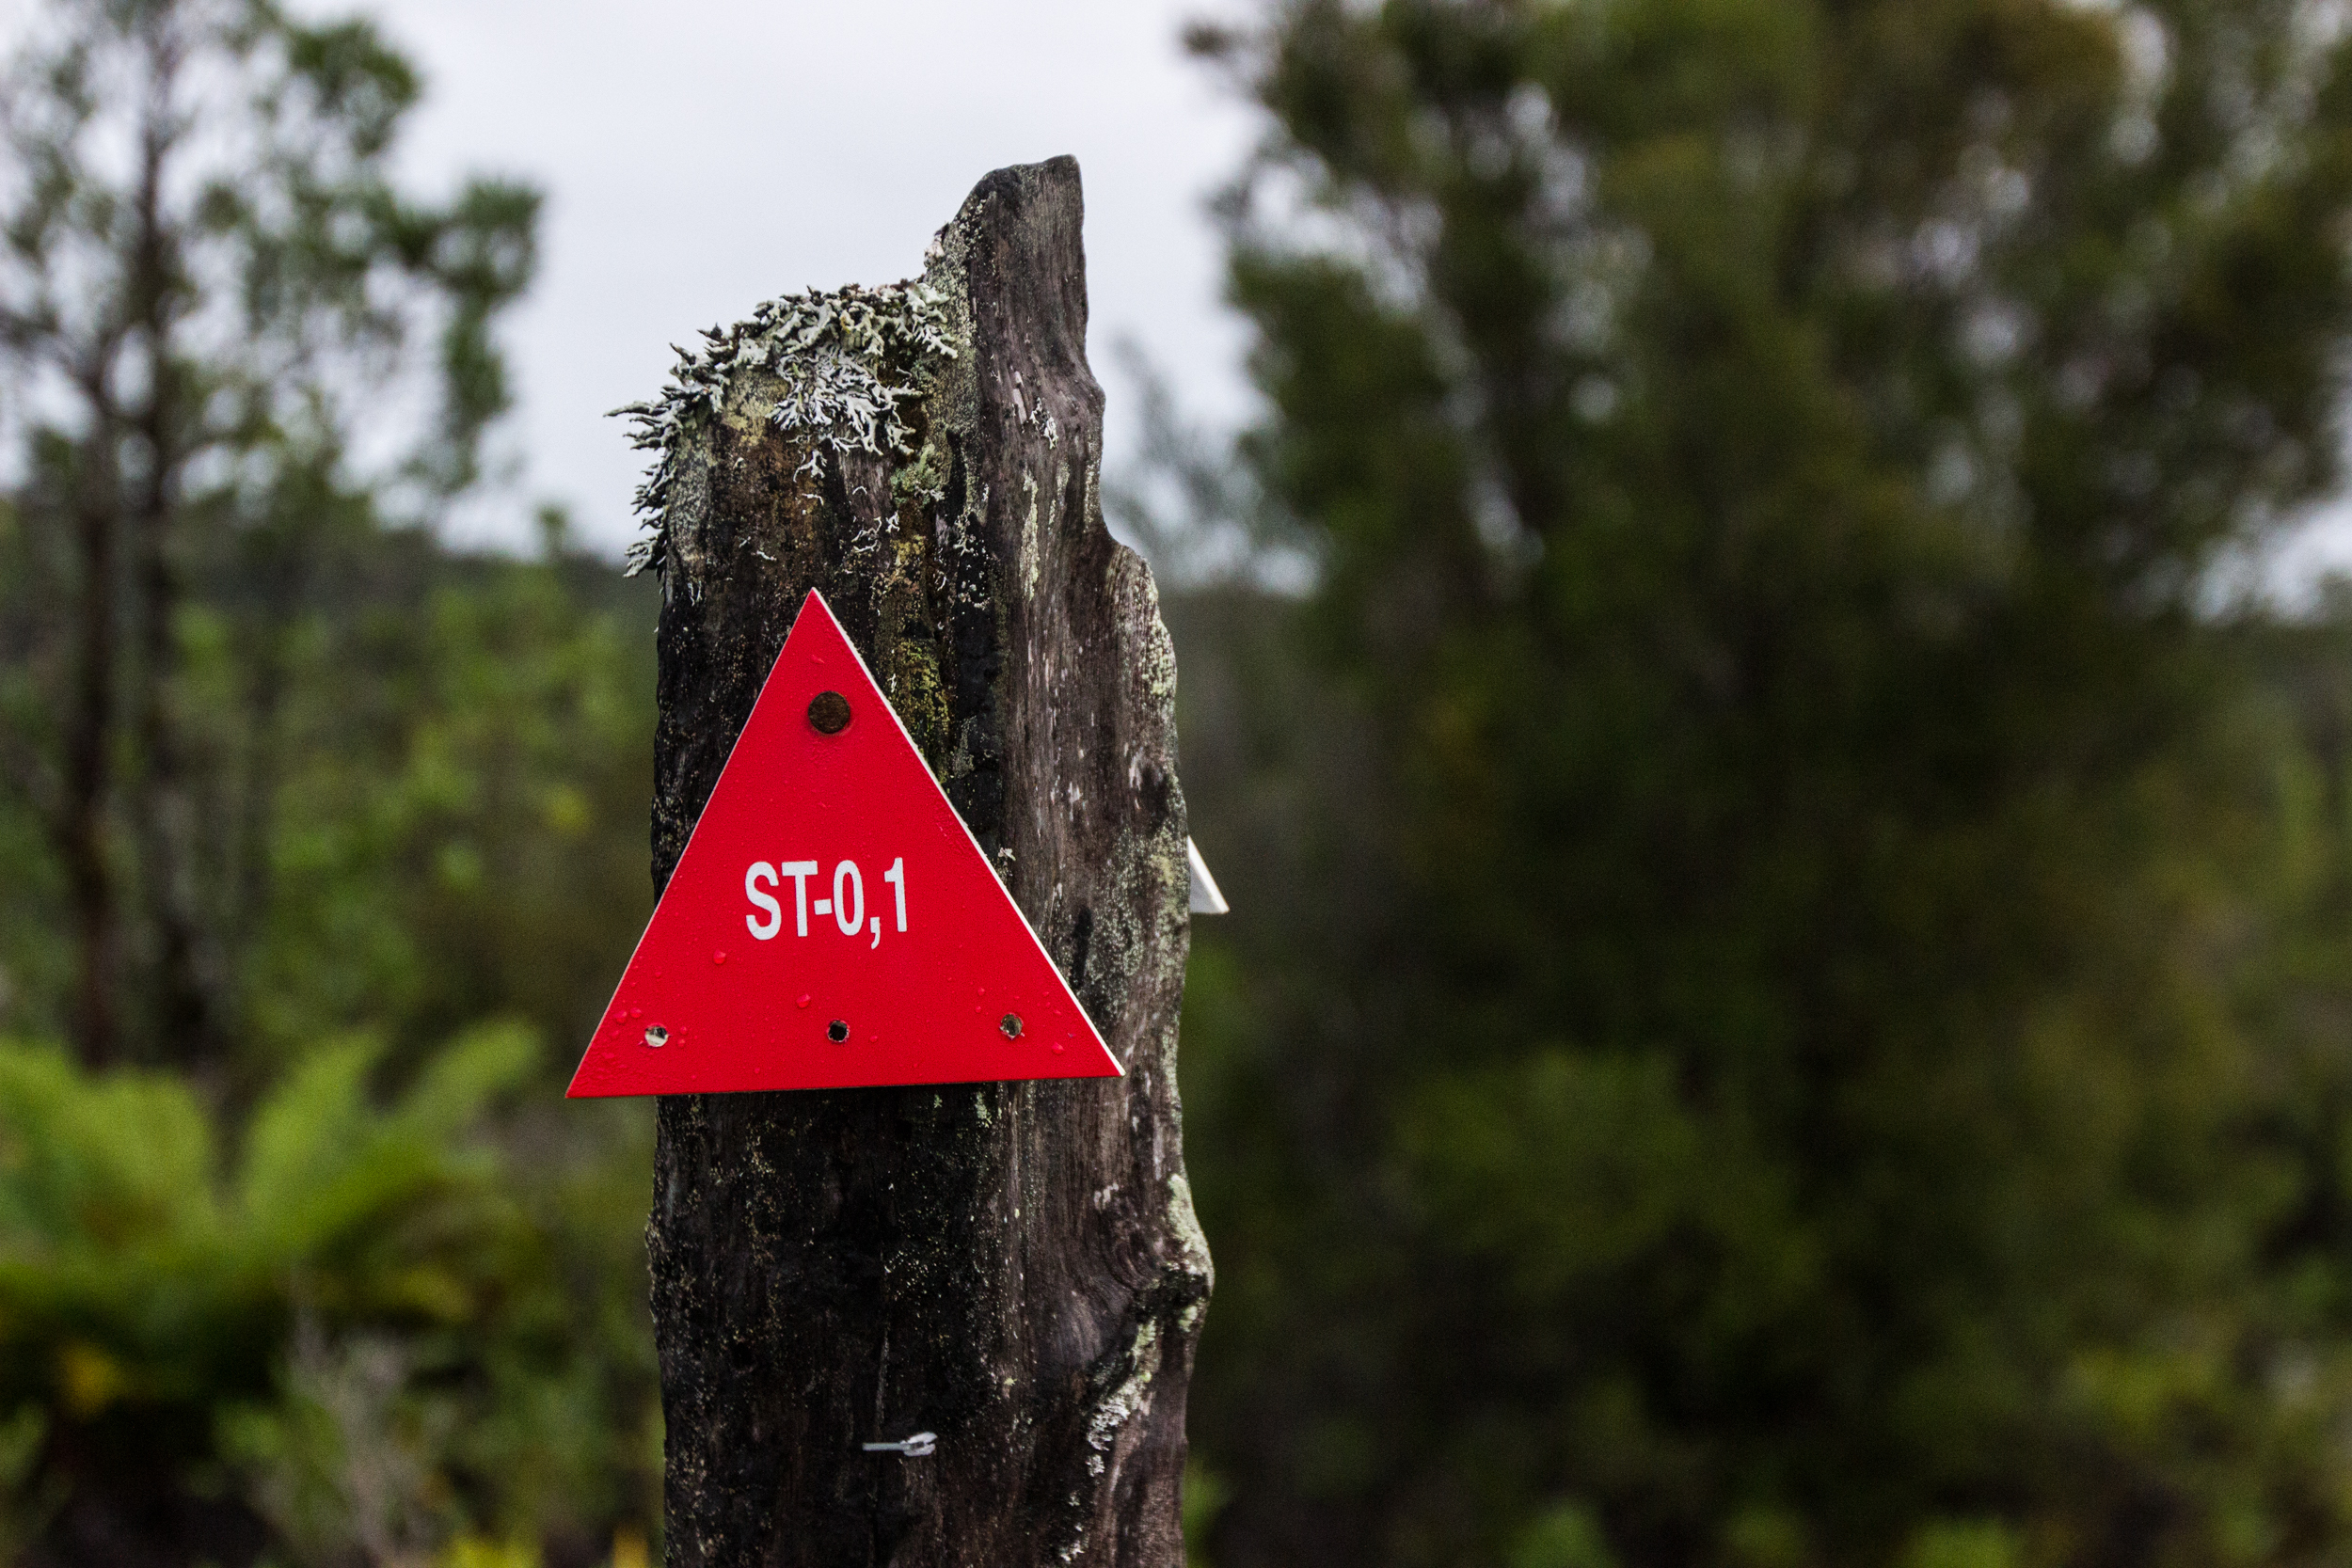 First trail marker on the Transversal Trail/Sendero Transversal (ST)